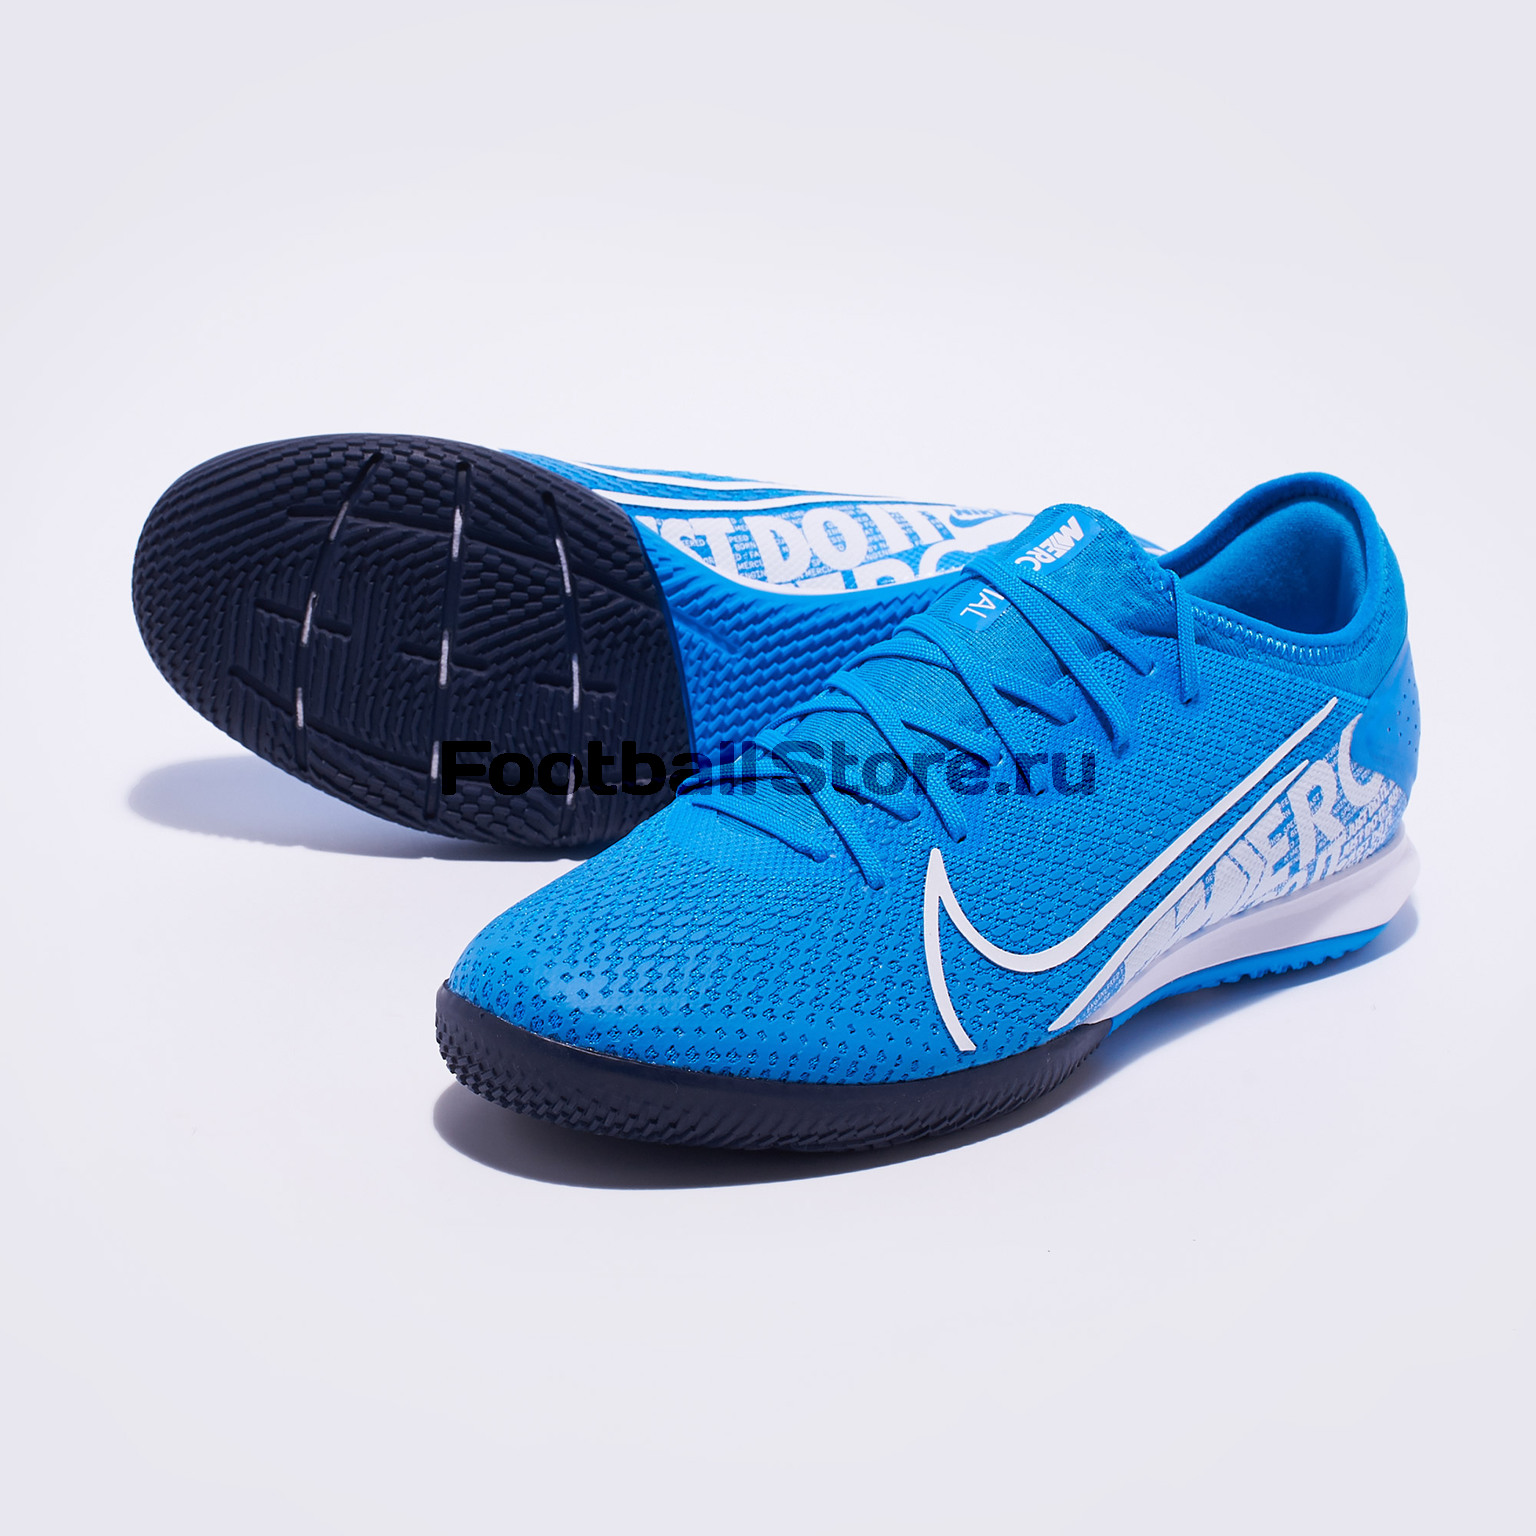 цена Футзалки Nike Vapor 13 Pro IC AT8001-414